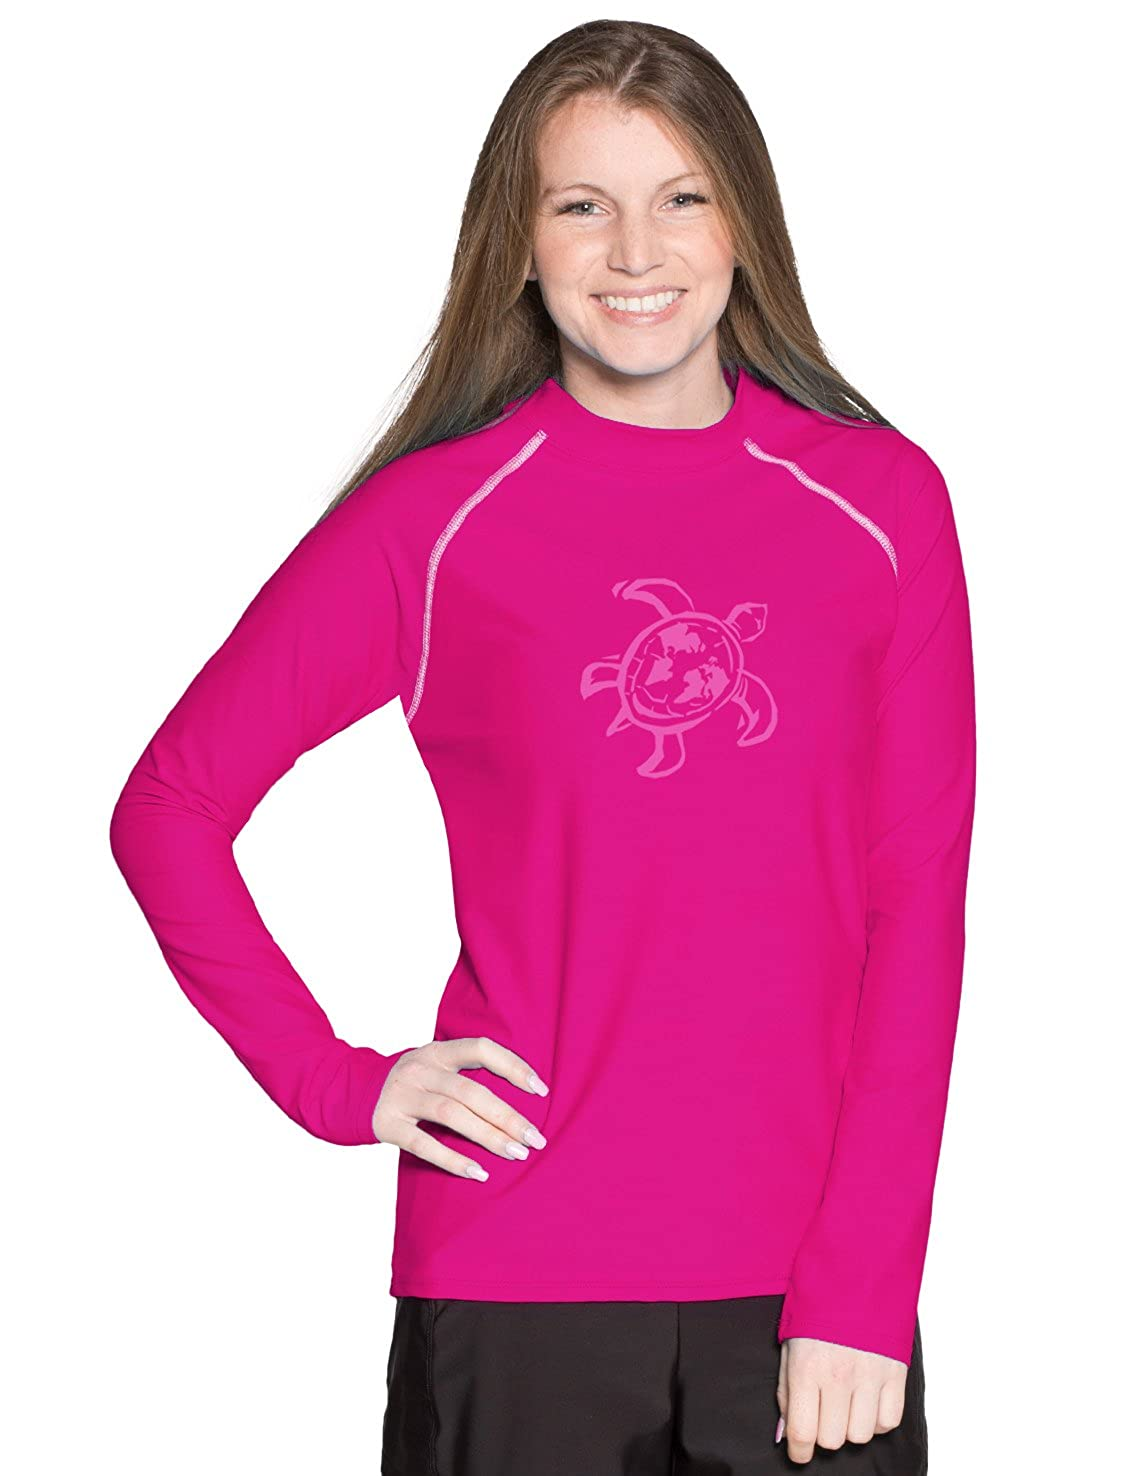 Tuga Unisex Adult Long Sleeve Rash Guard UPF 50 Sun Protection Swim Shirt